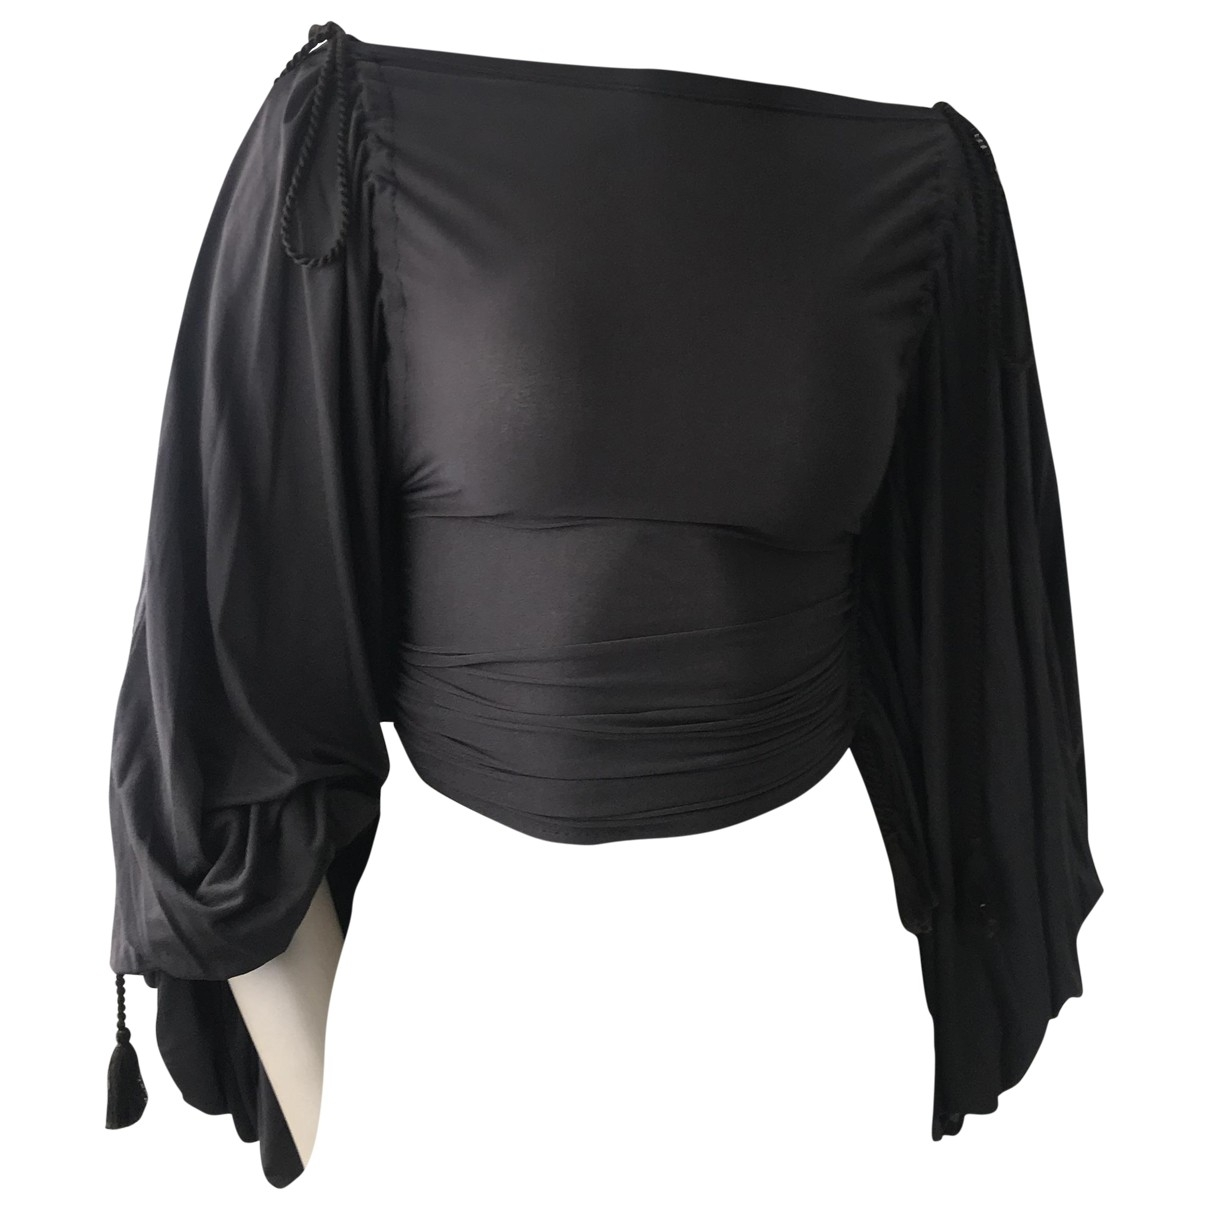 Gianfranco Ferré \N Brown Cotton  top for Women 38 IT